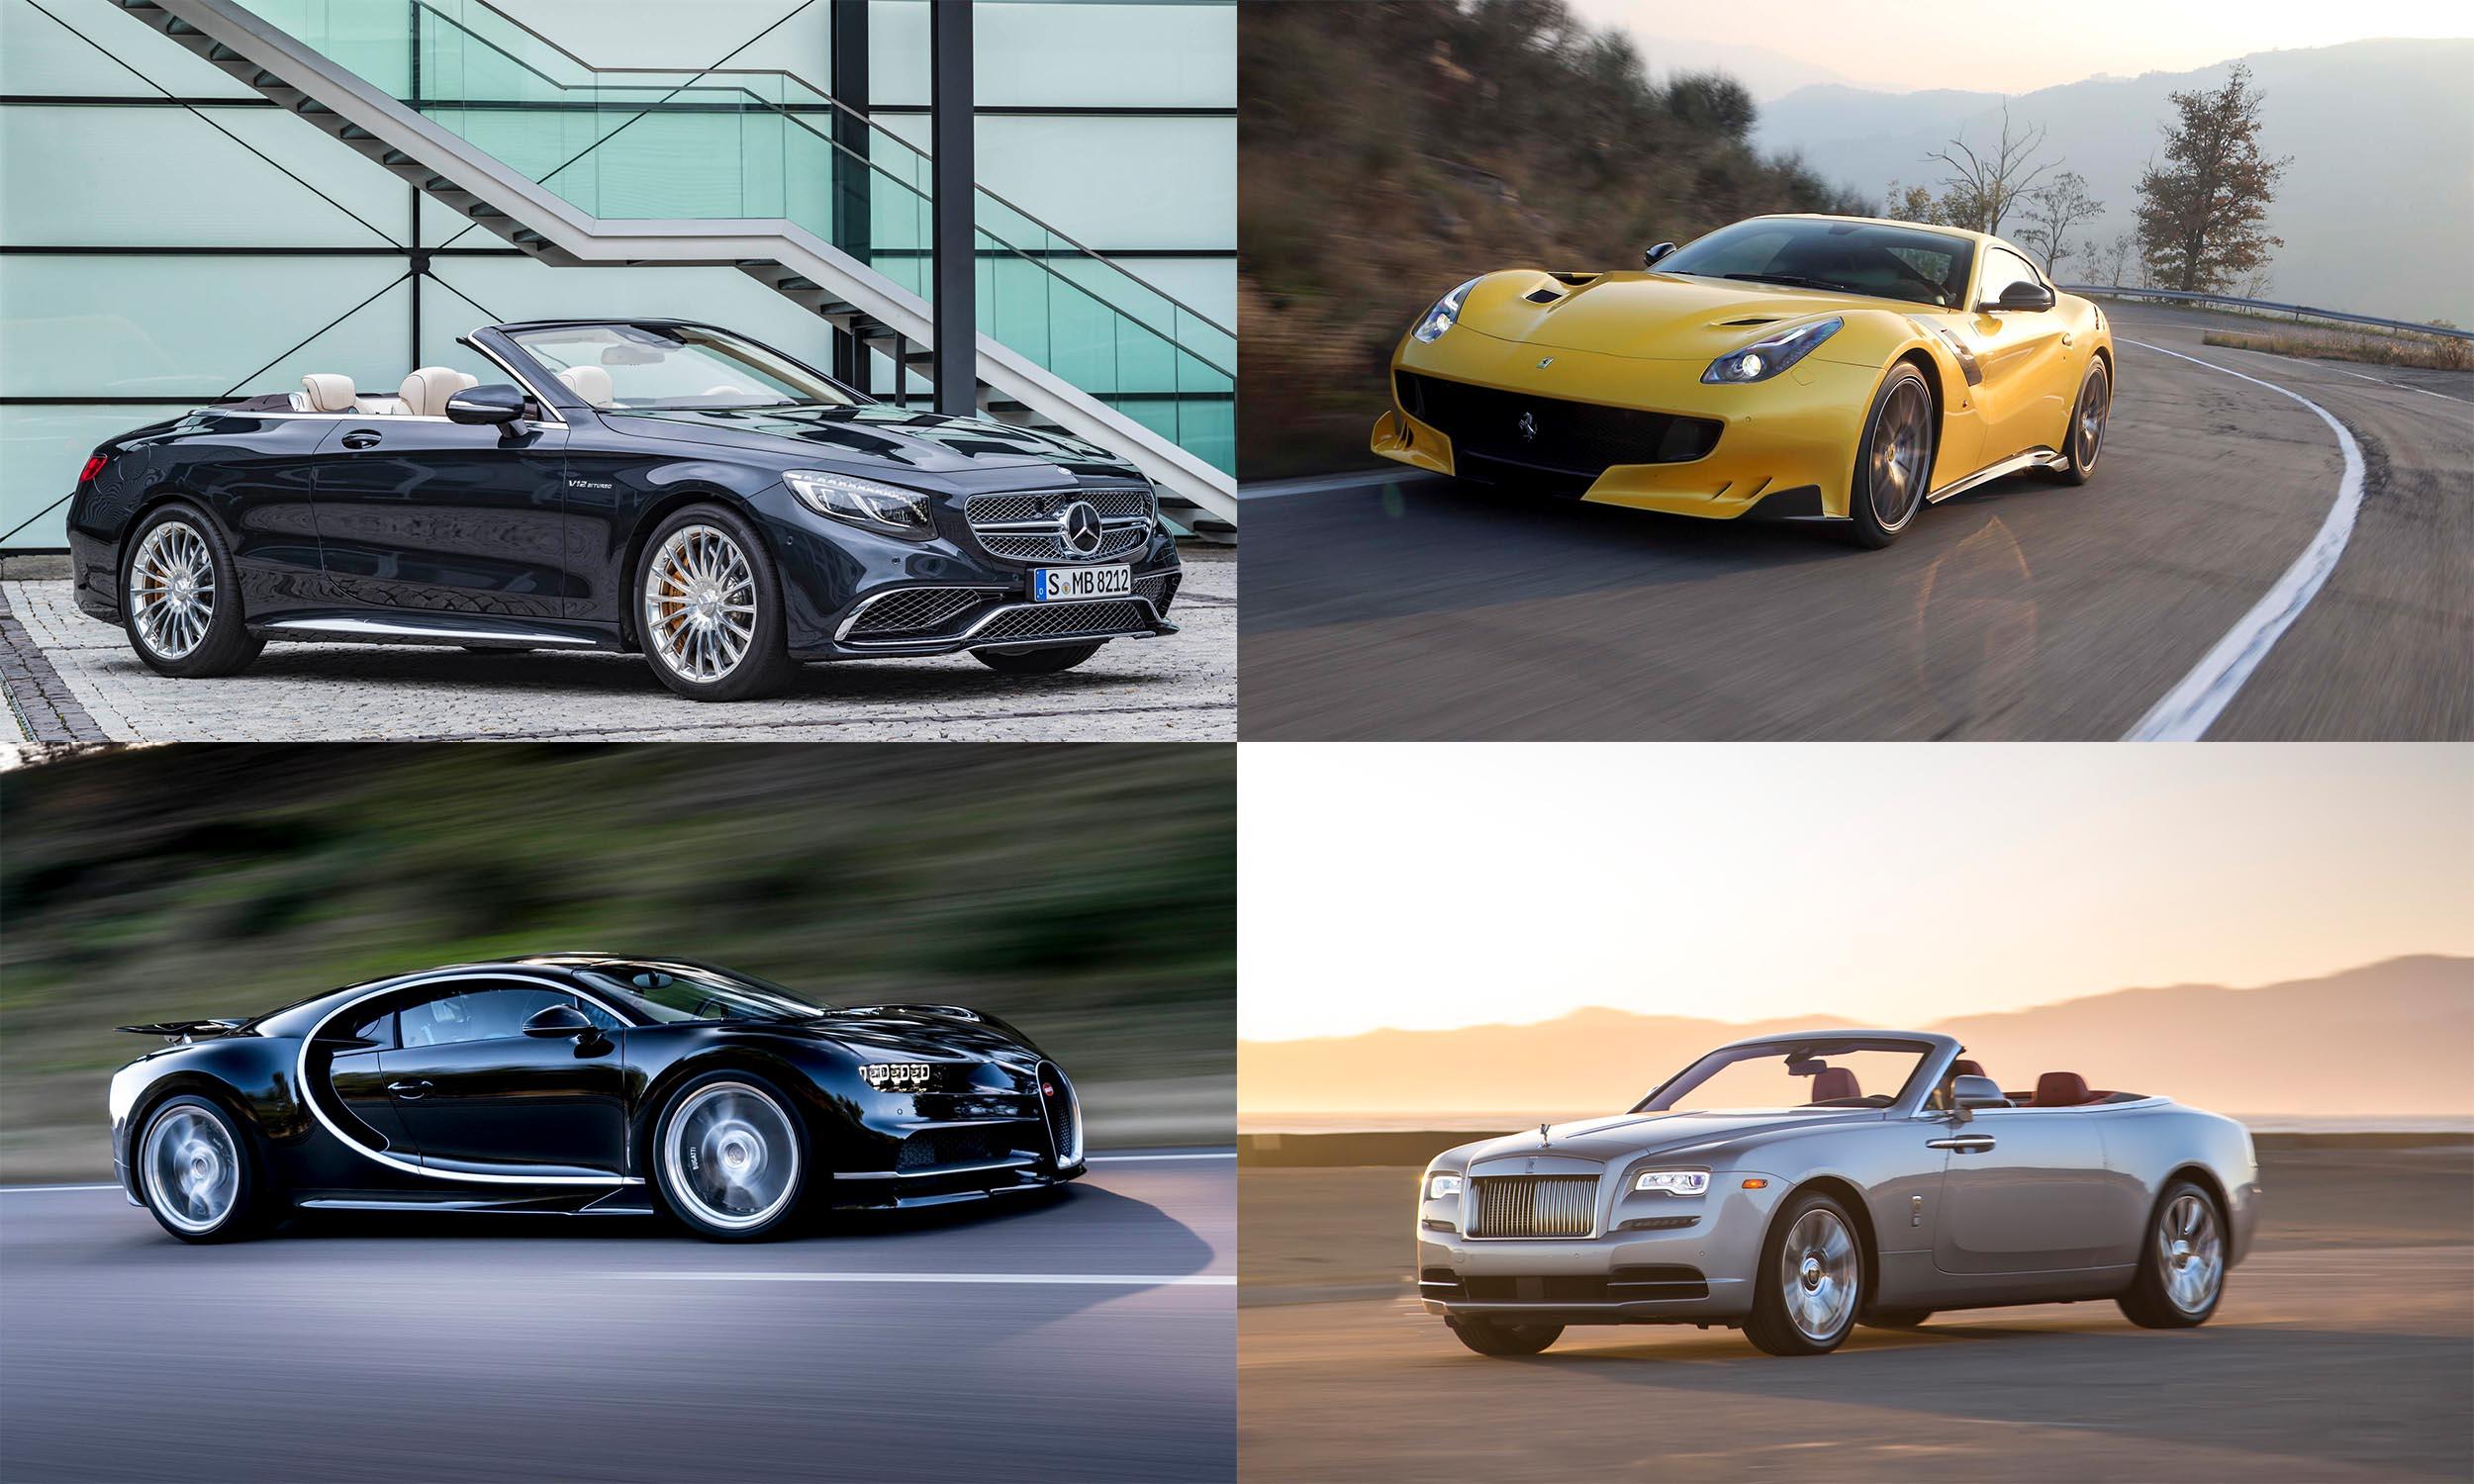 © Mercedes-Benz USA, © Ferrari S.p.A, © BMW AG, © Bugatti Automobiles S.A.S.